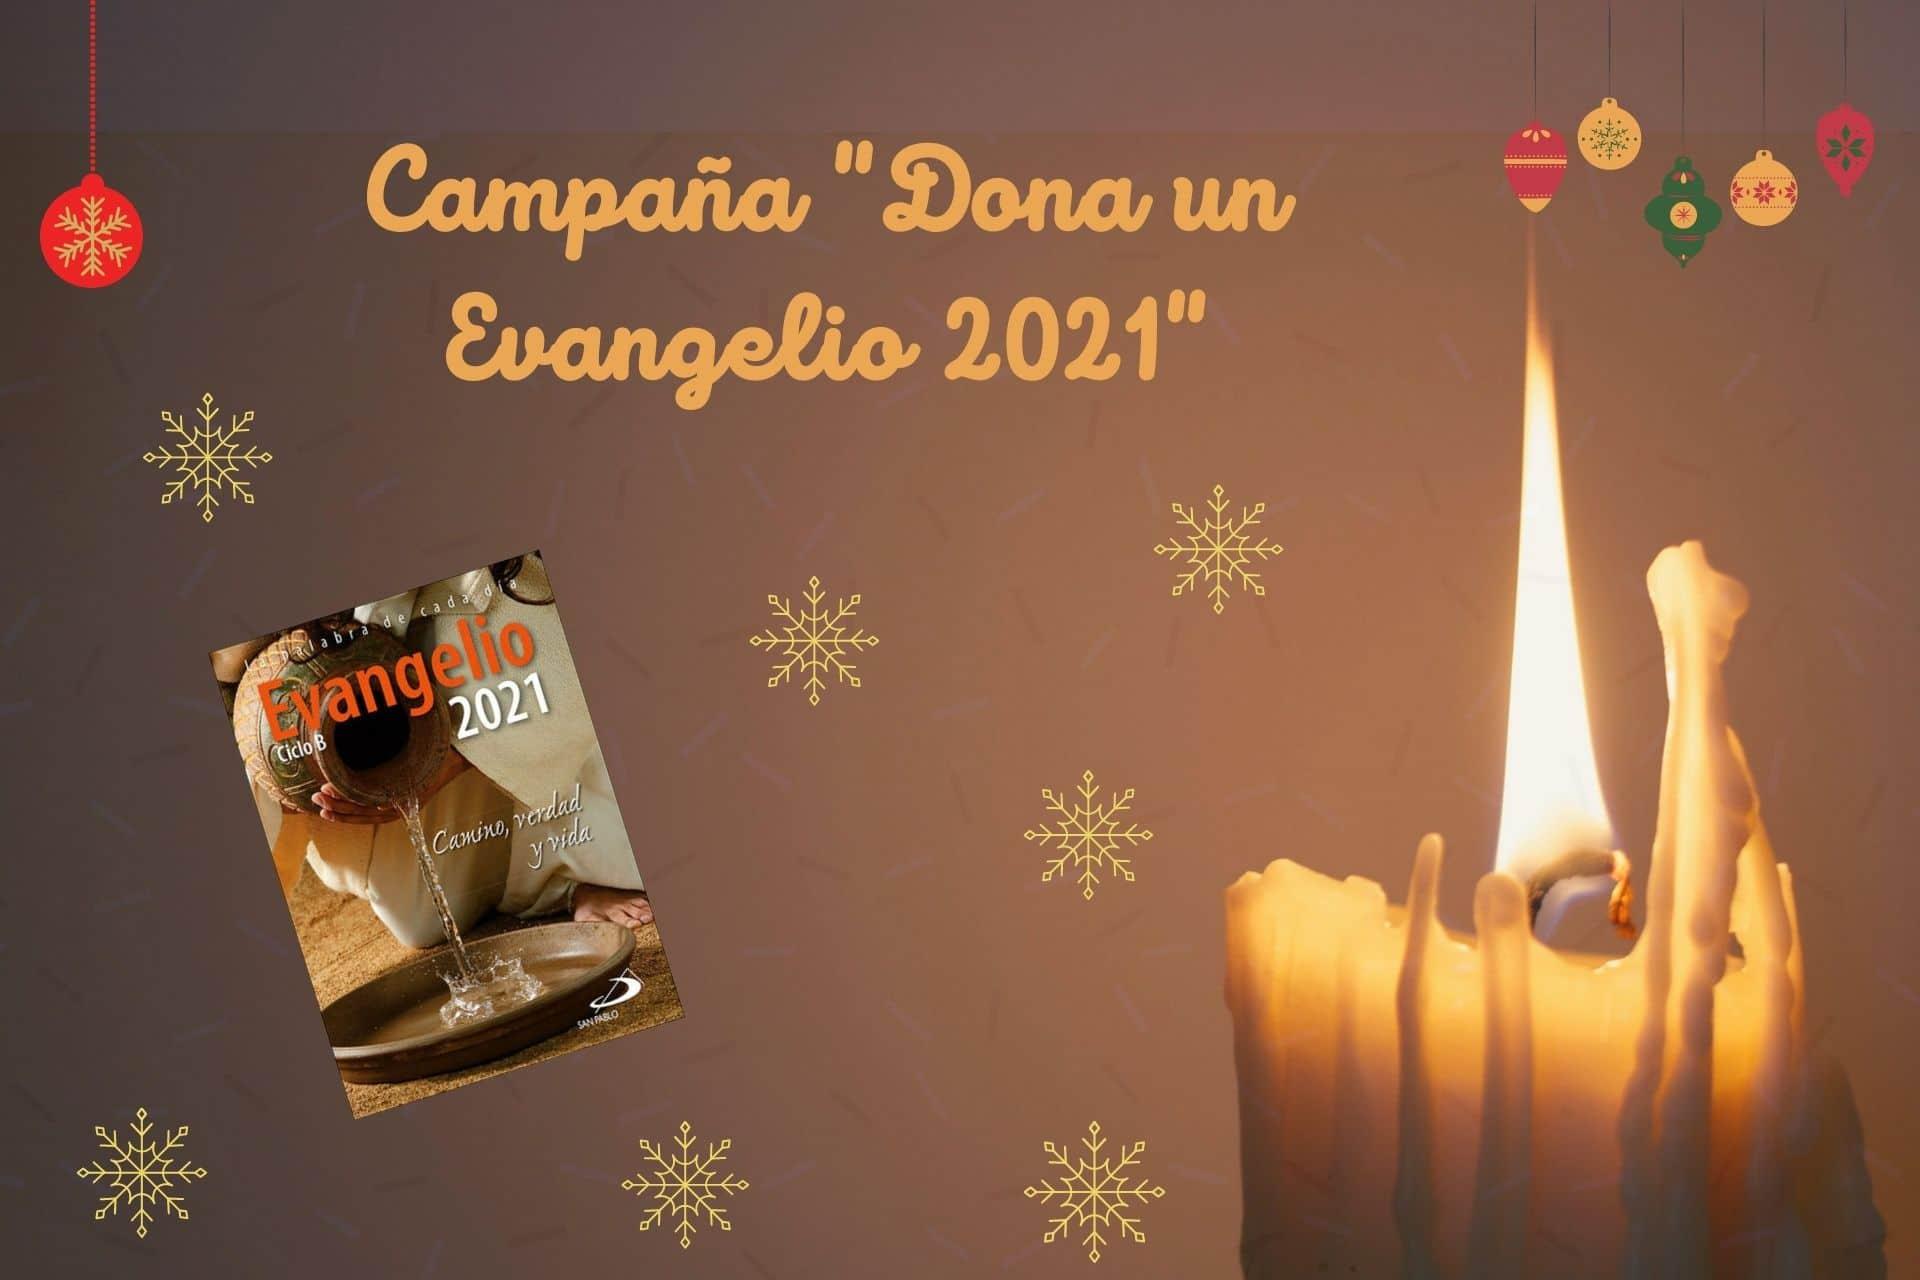 Cabecera Campaña Dona un Evangelio 2021